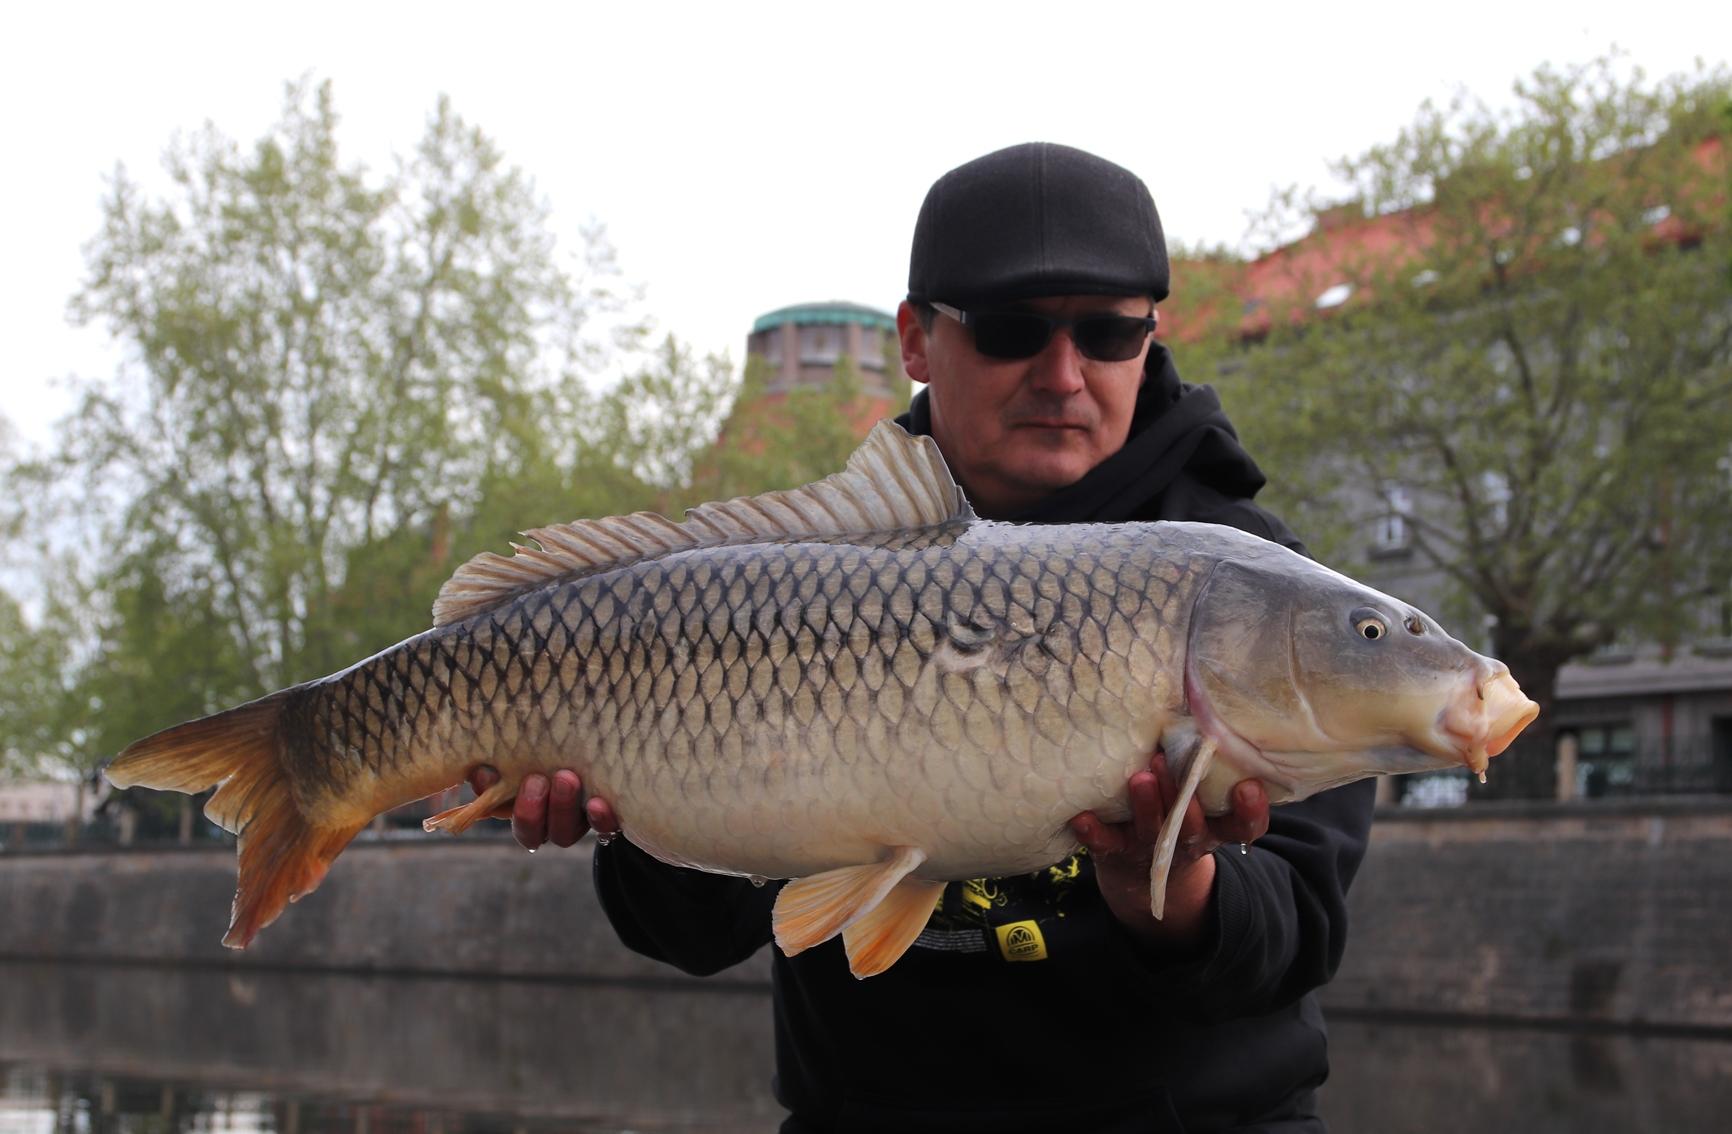 Boilies Mivardi Rapid Easy Catch Anglická Jahoda 3300 gr 24 mm